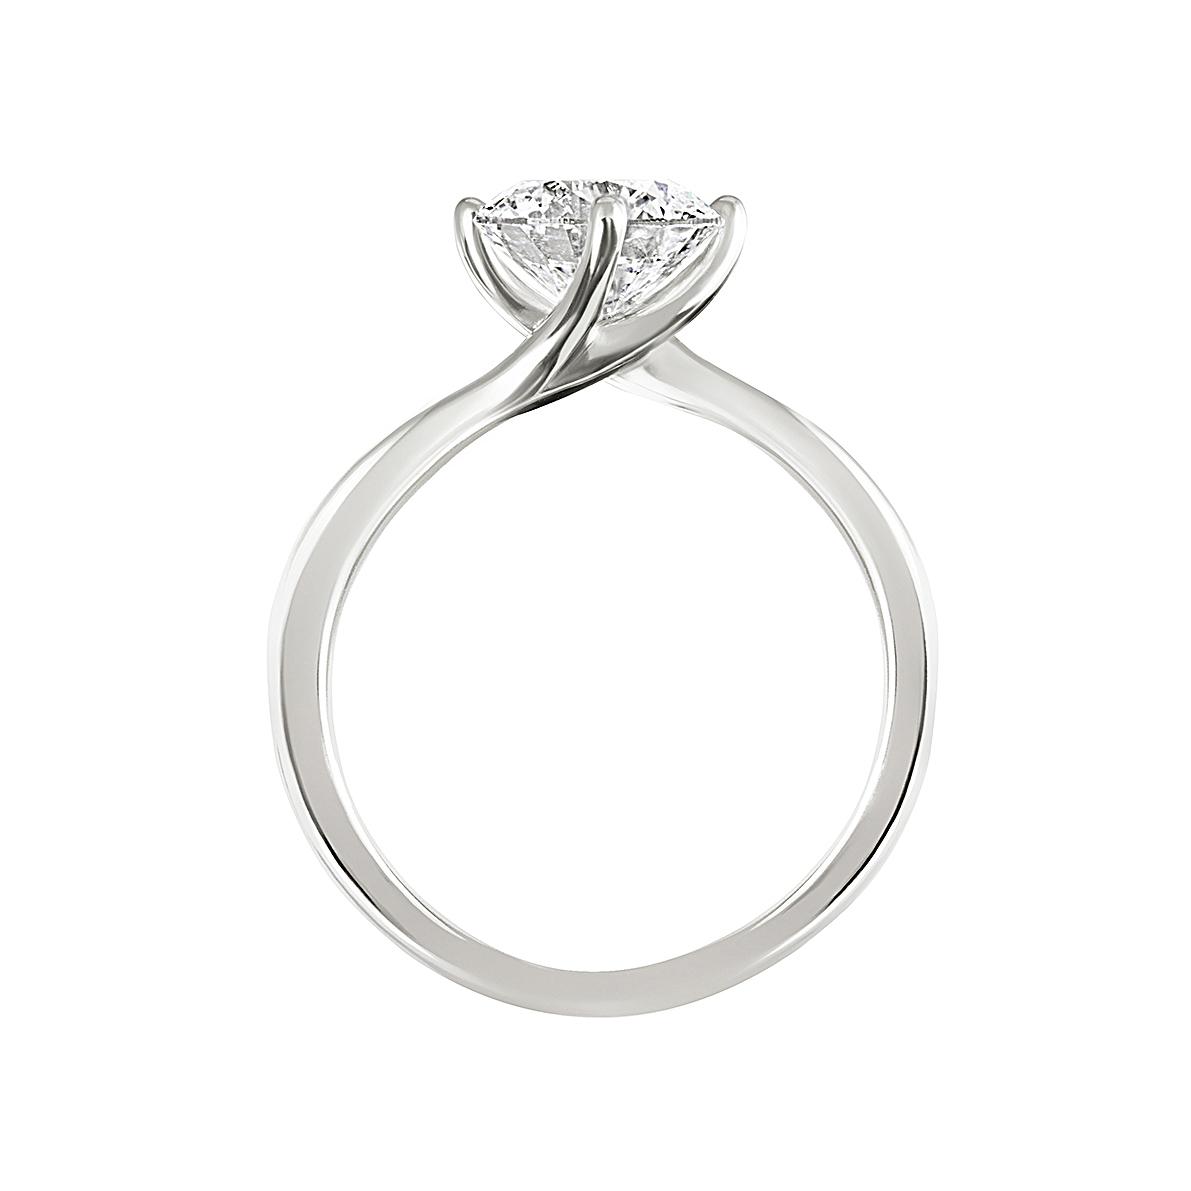 Grace-platinum-solitaire-diamond-engagement-ring-profile.jpg